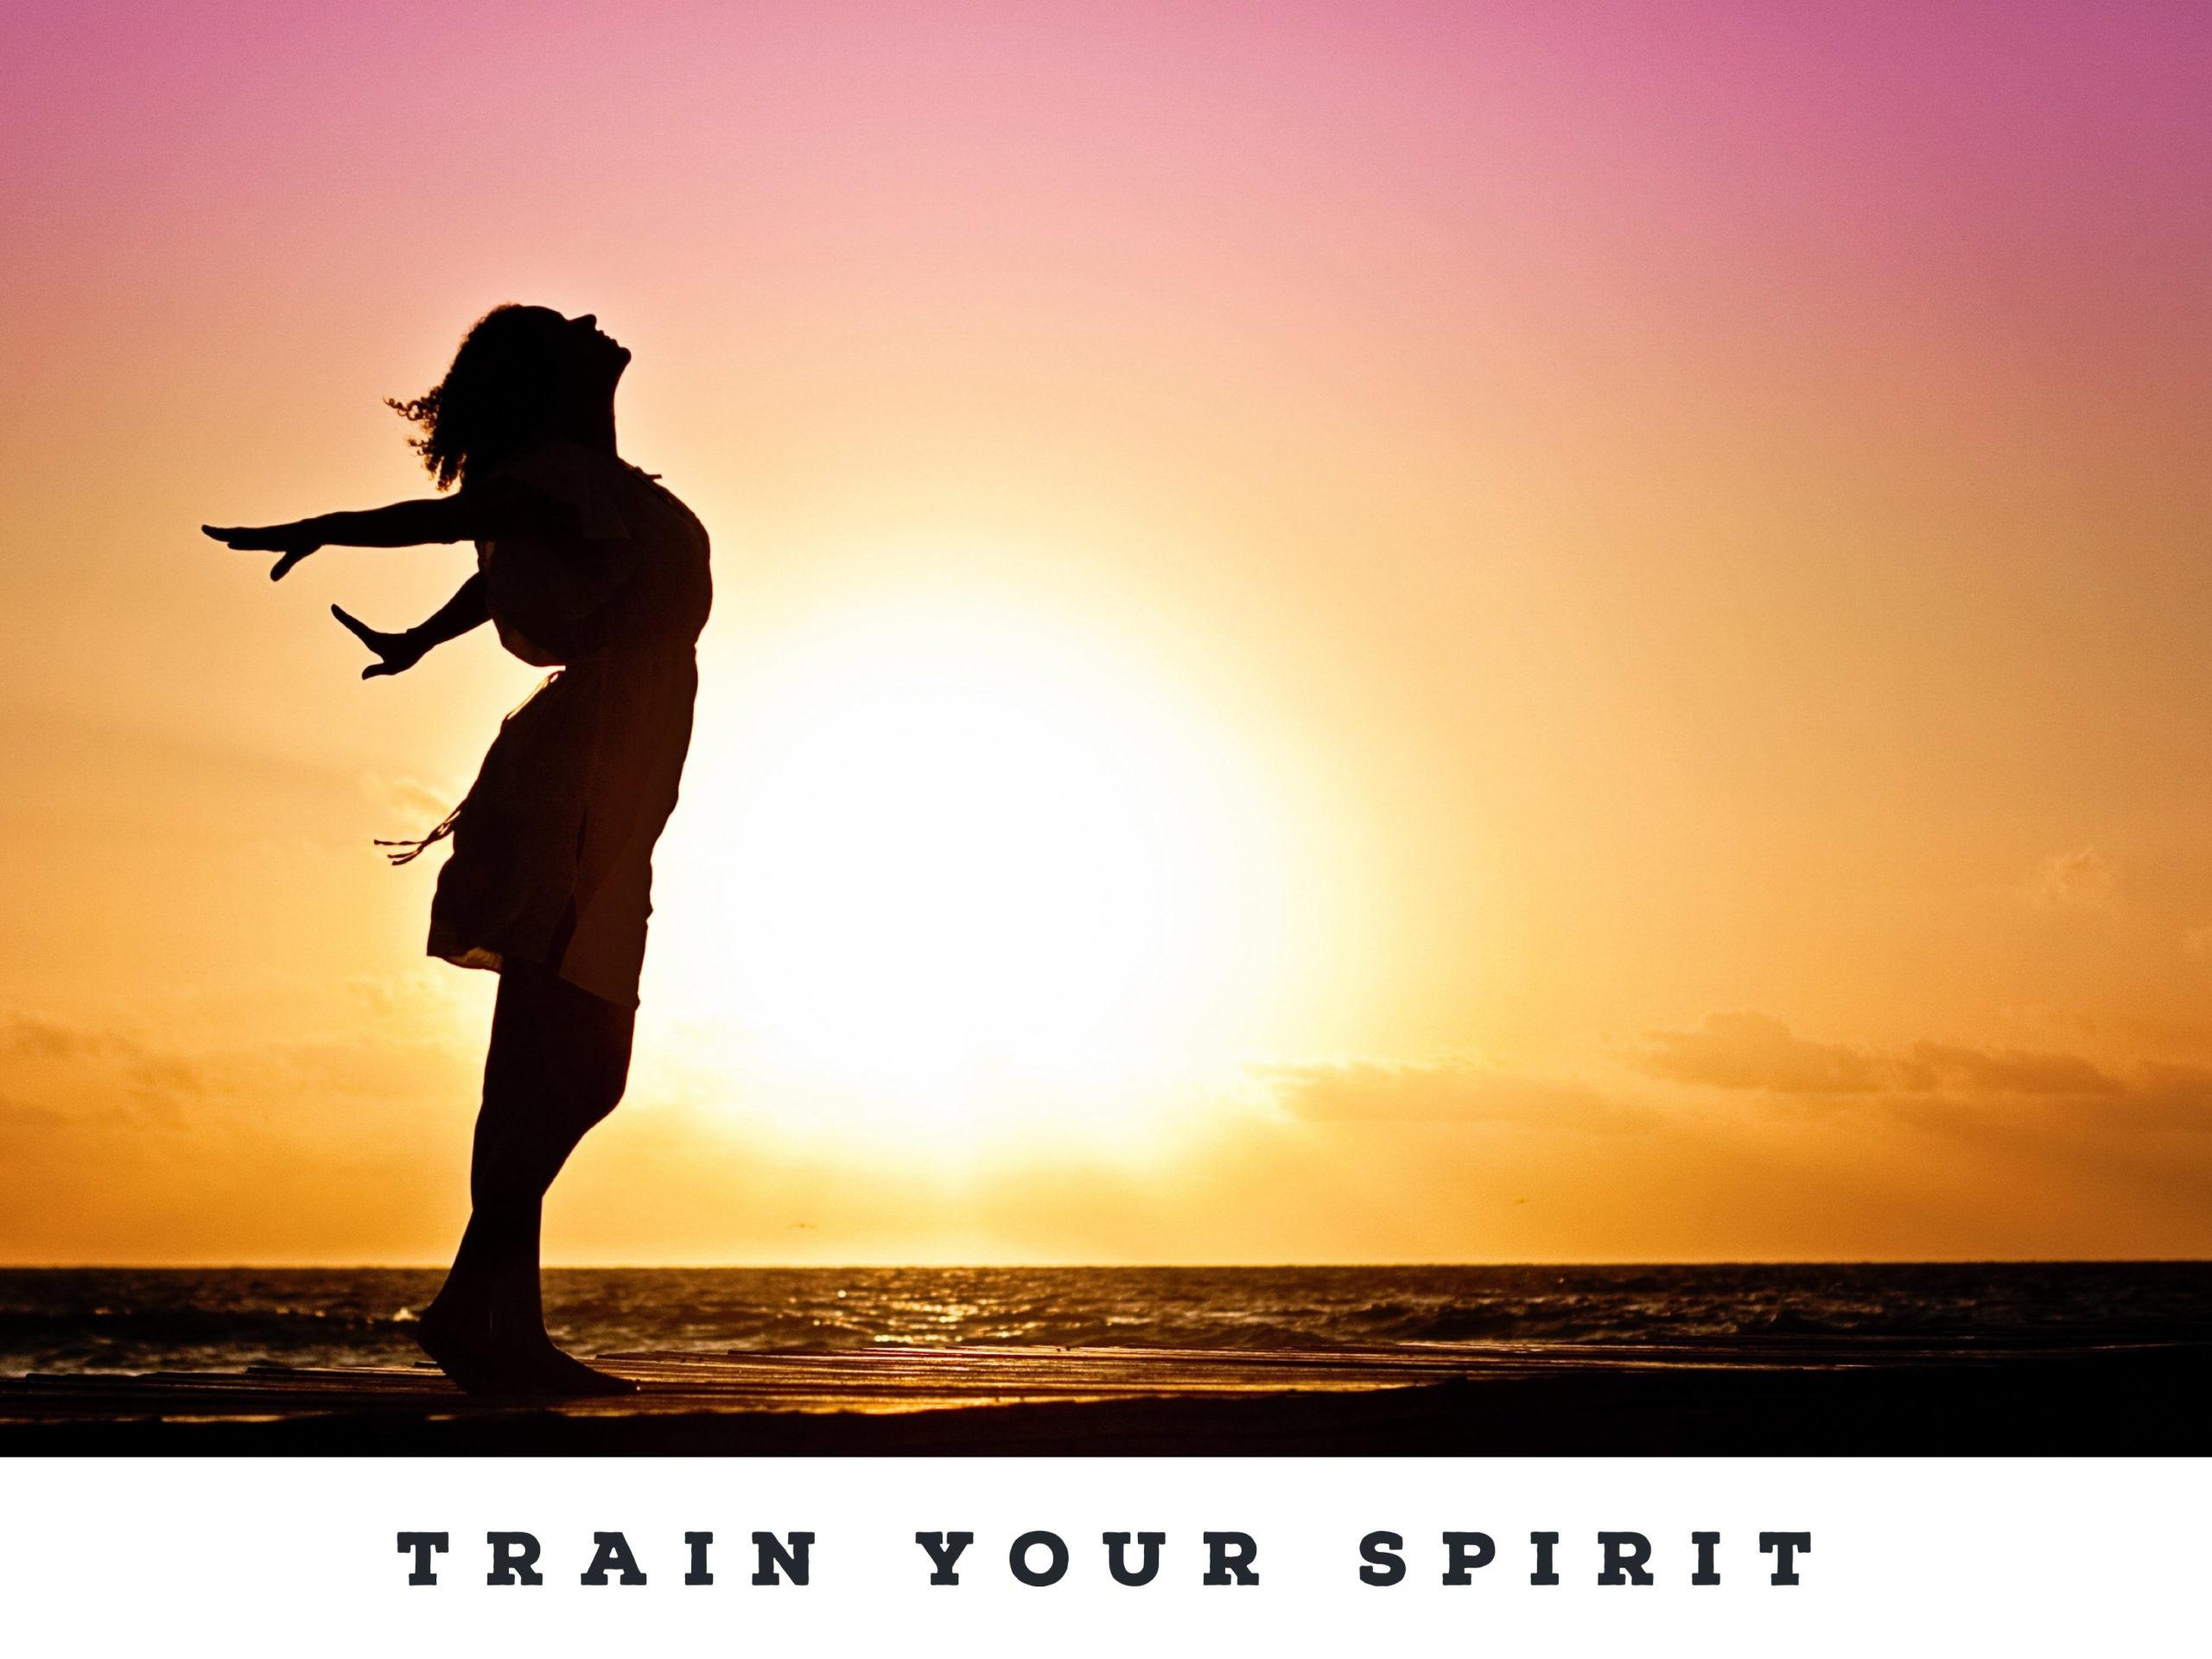 Train Your Spirit